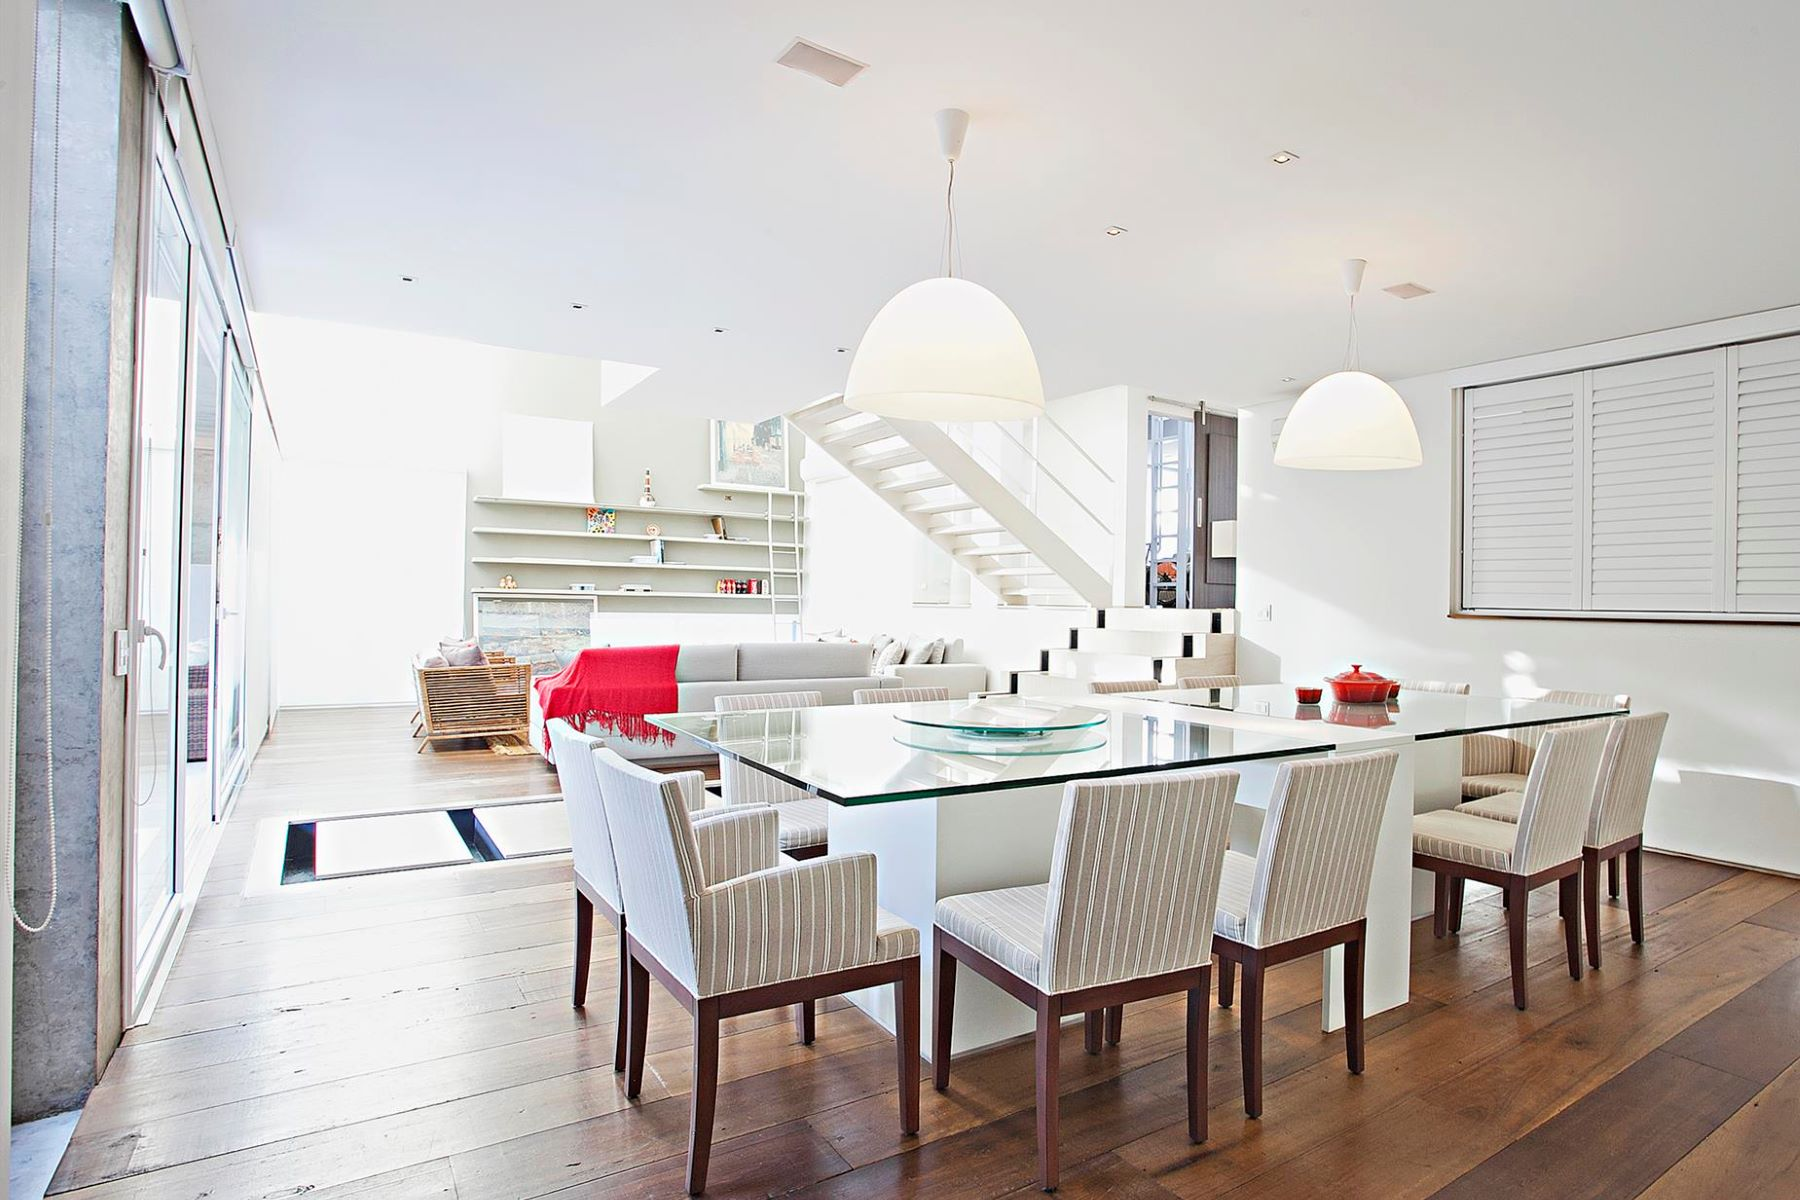 Single Family Home for Sale at Distinctive Project Rua Bernardino Machado Sao Paulo, Sao Paulo 04722-120 Brazil